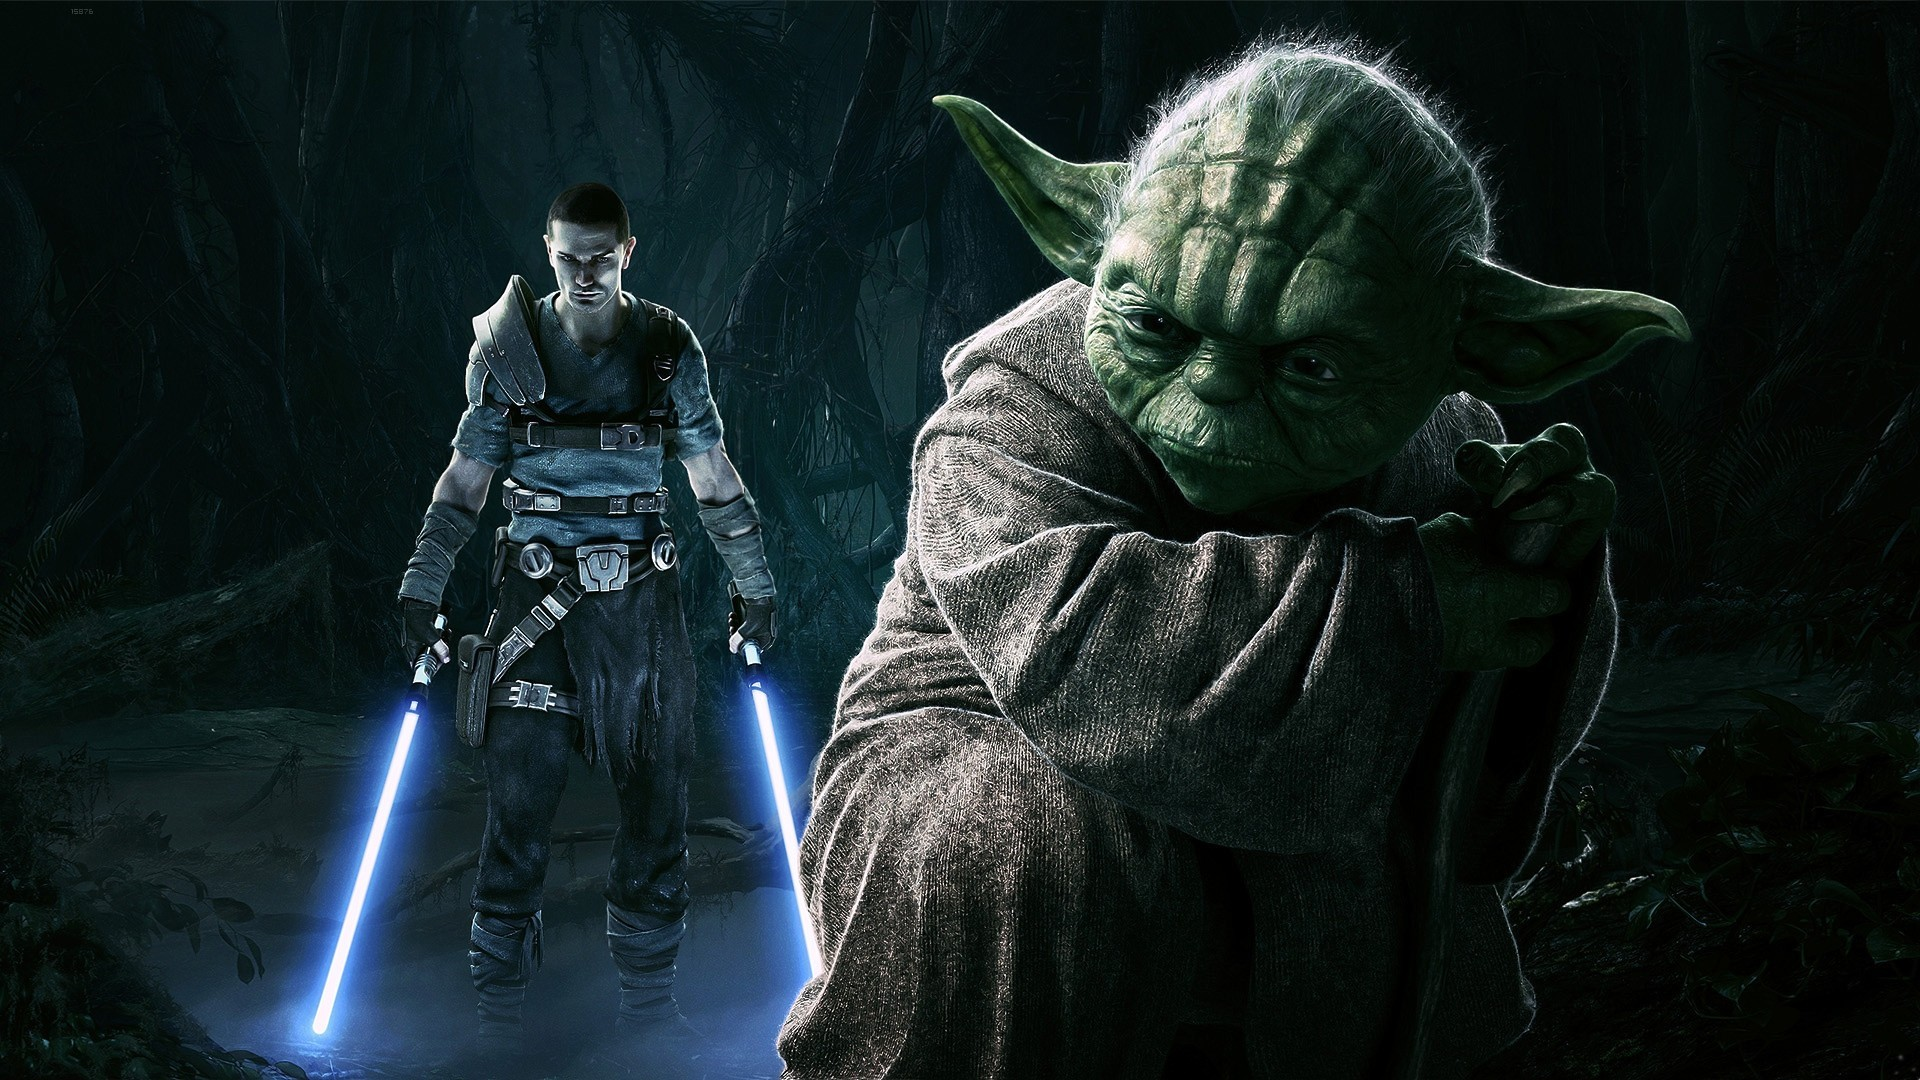 General 1920x1080 Star Wars Yoda Jedi lightsaber